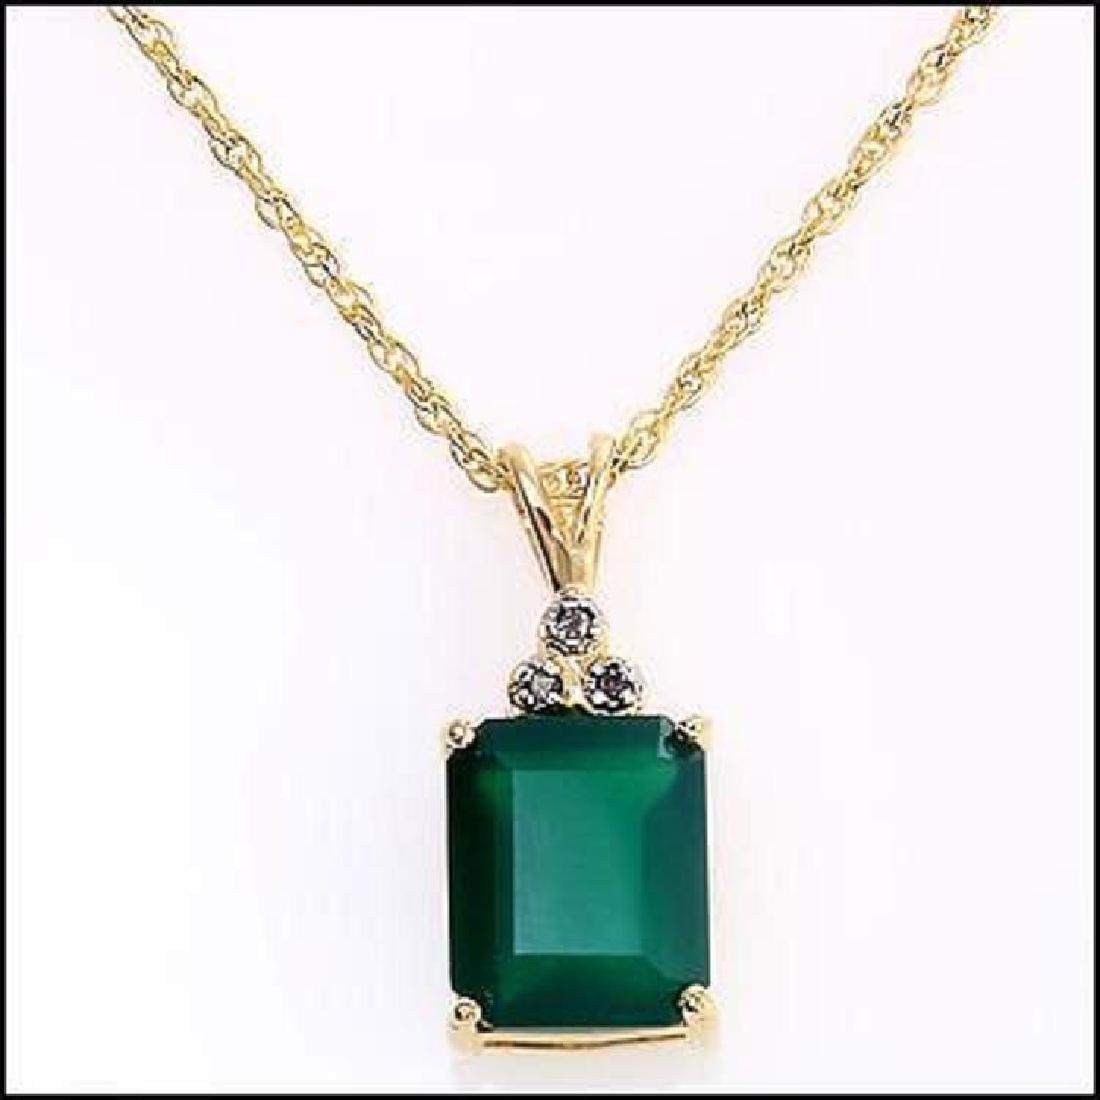 Genuine 4.7 CT Green Agate Diamond Pendant